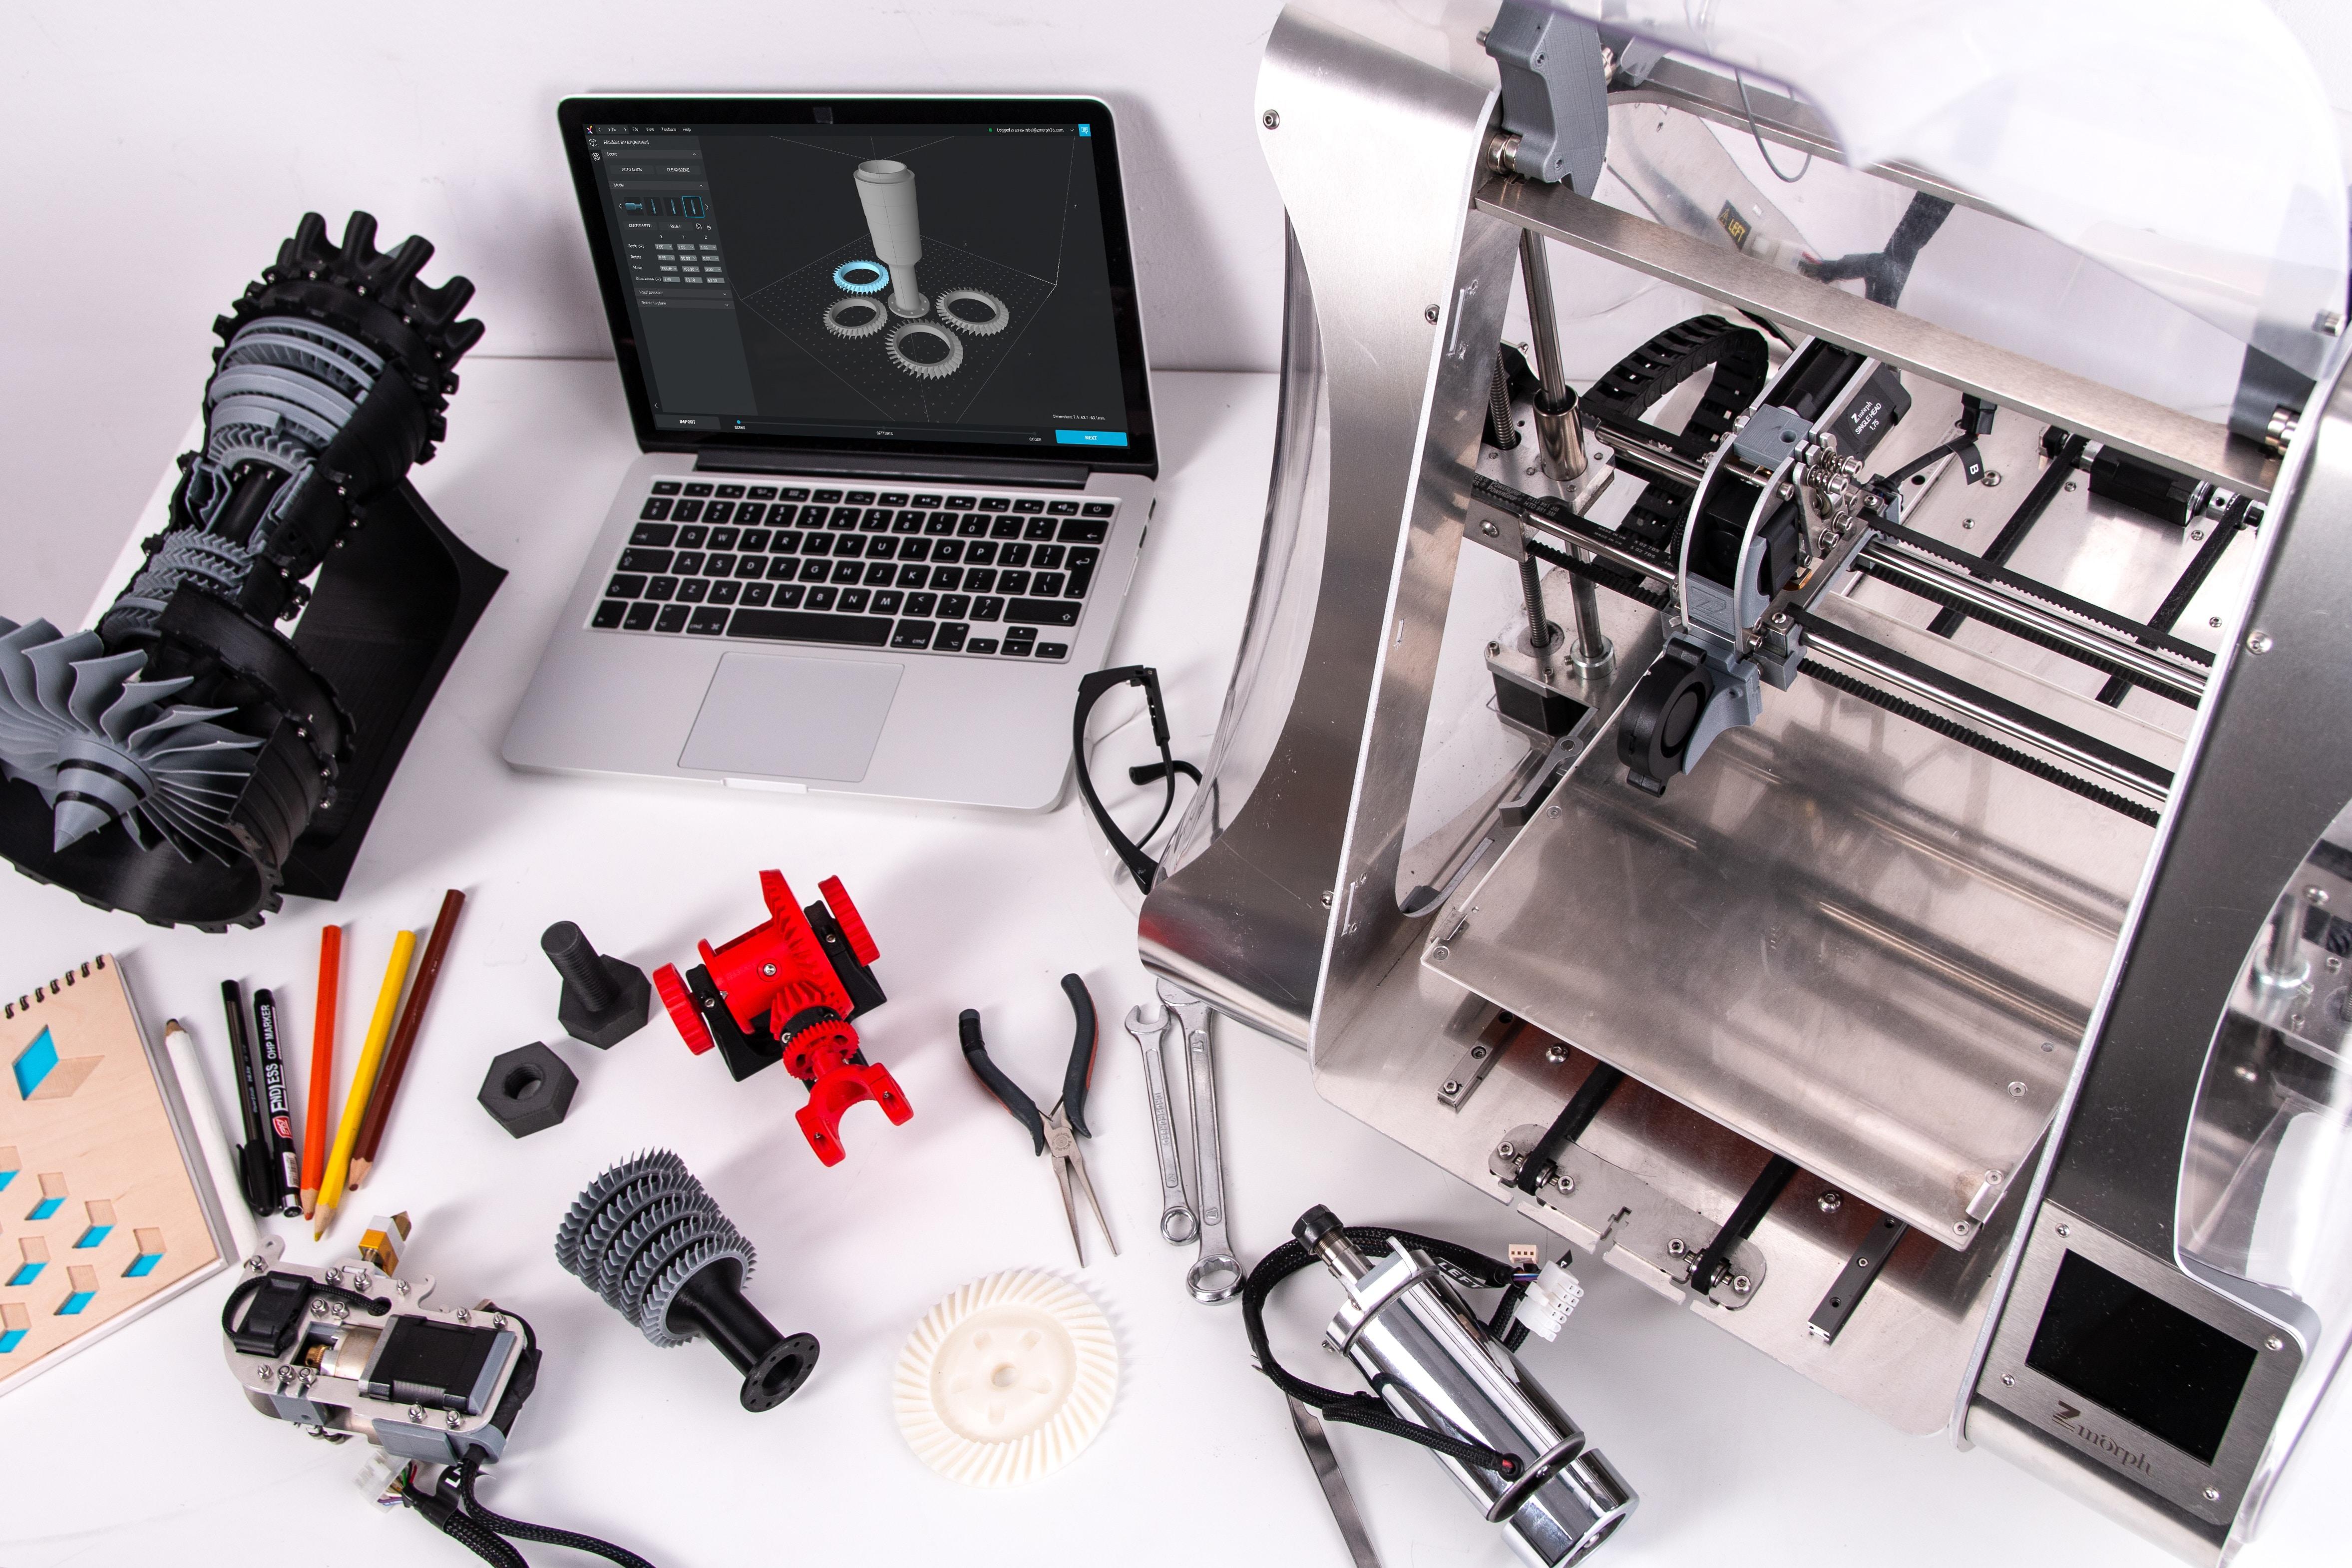 Image by ZMorph Multitool 3D Printer